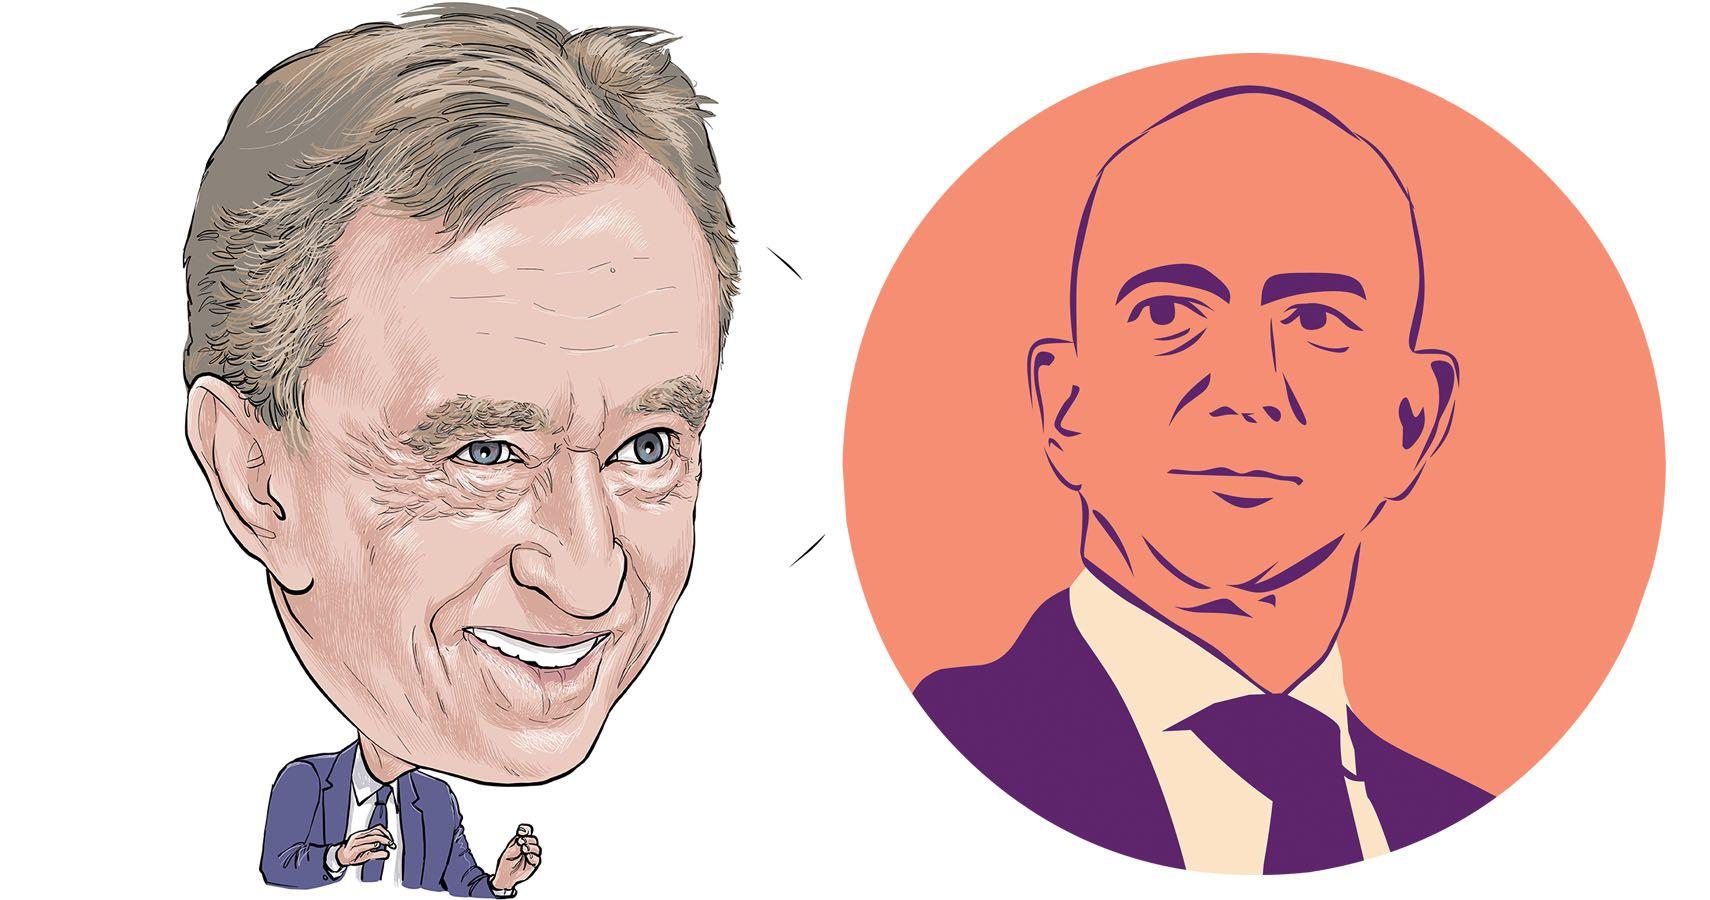 Bernard Arnault Surpasses Jeff Bezos To Become World's Wealthiest Person